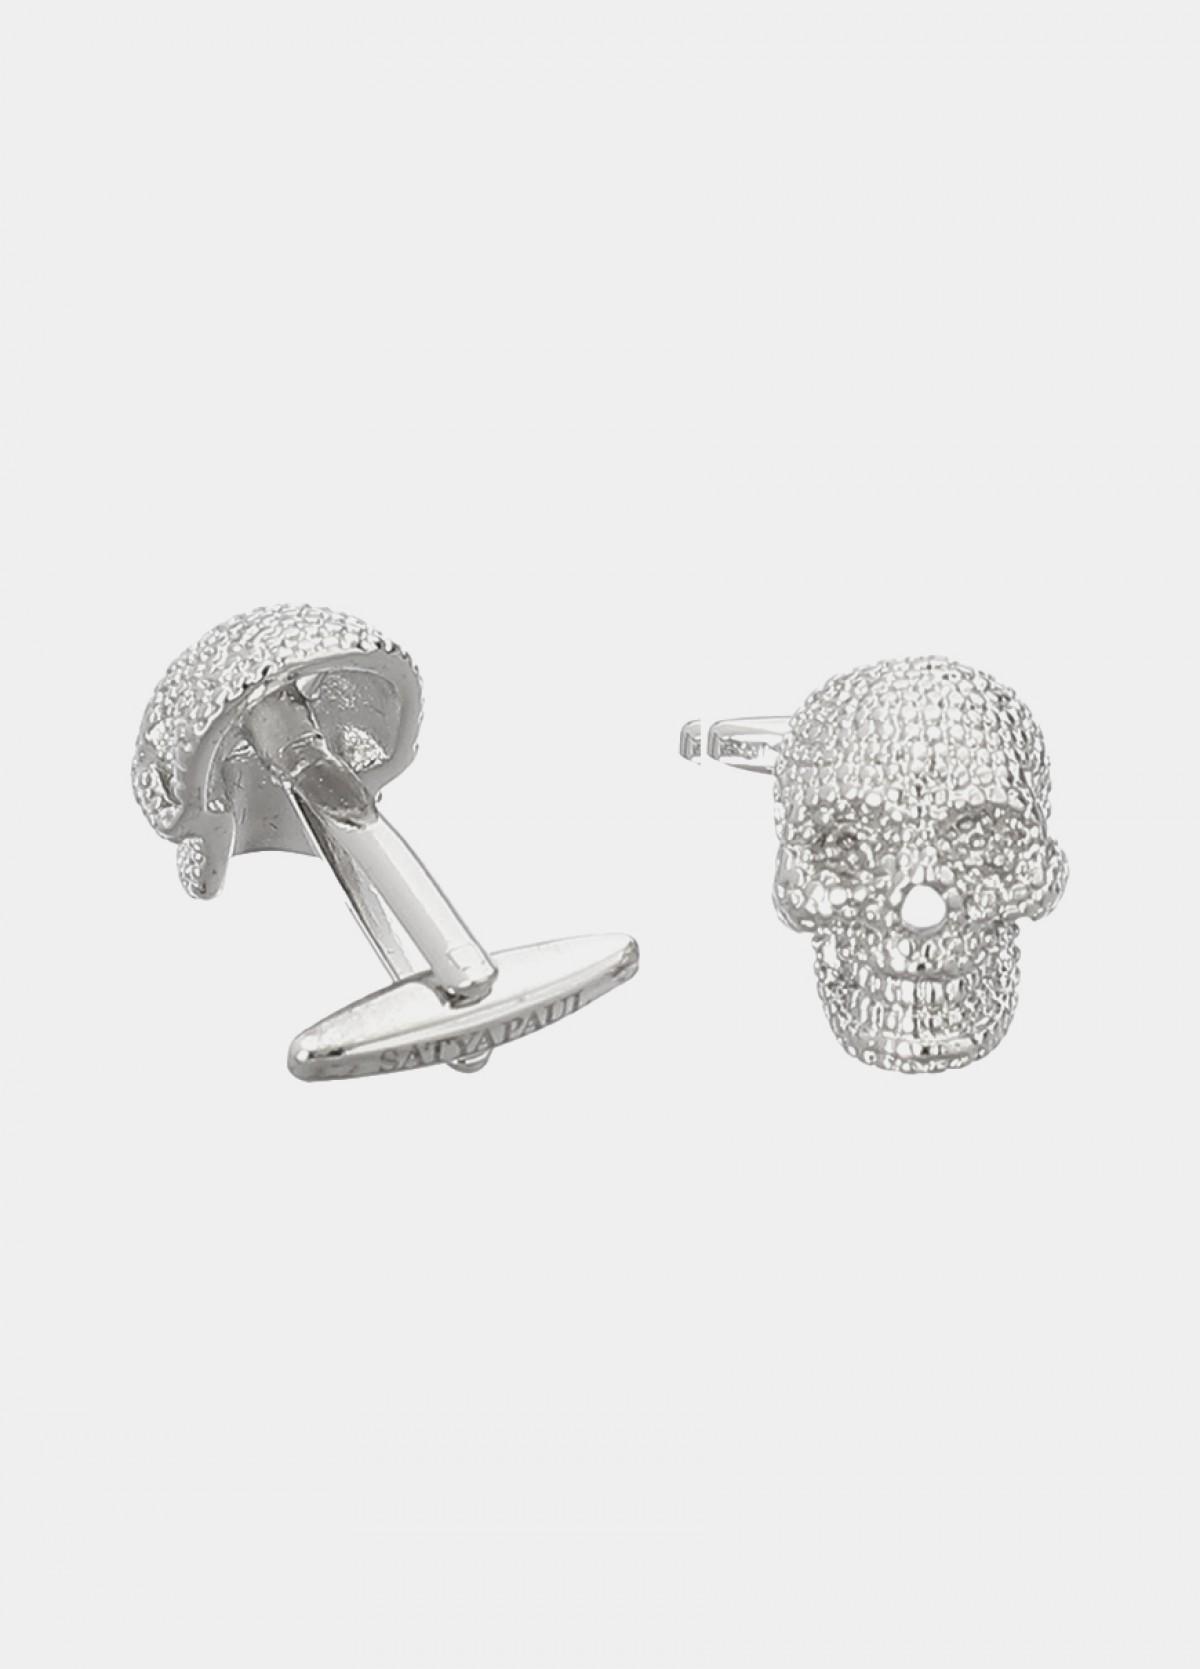 Nickel Shiny Metal Cufflinks